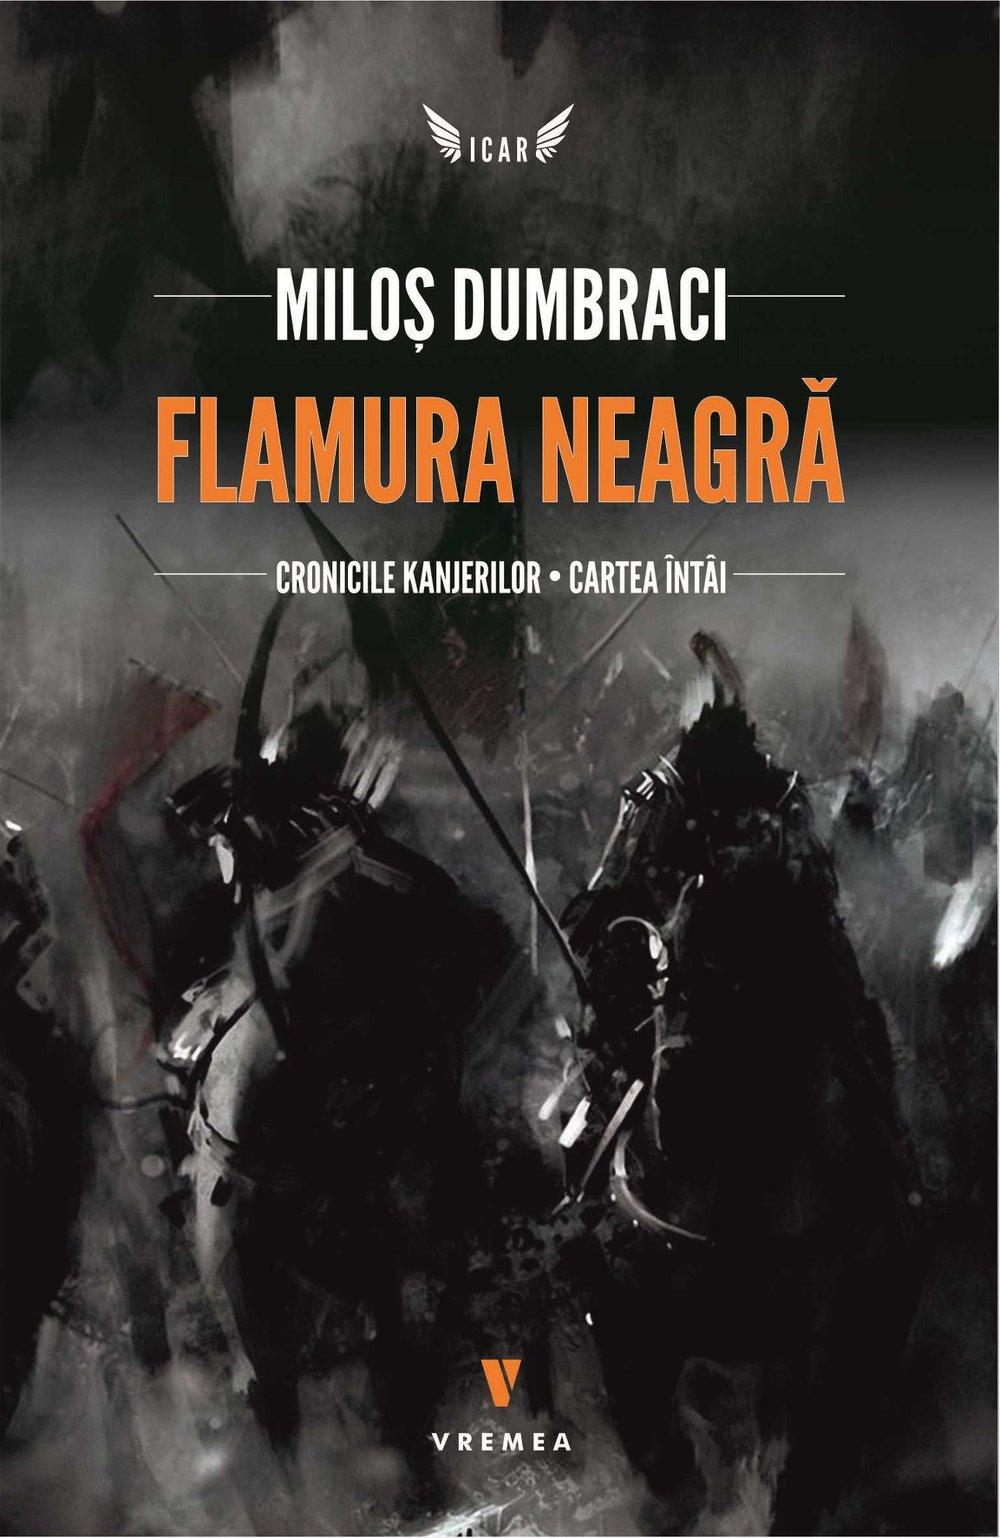 coperta_flamura_neagra.jpg